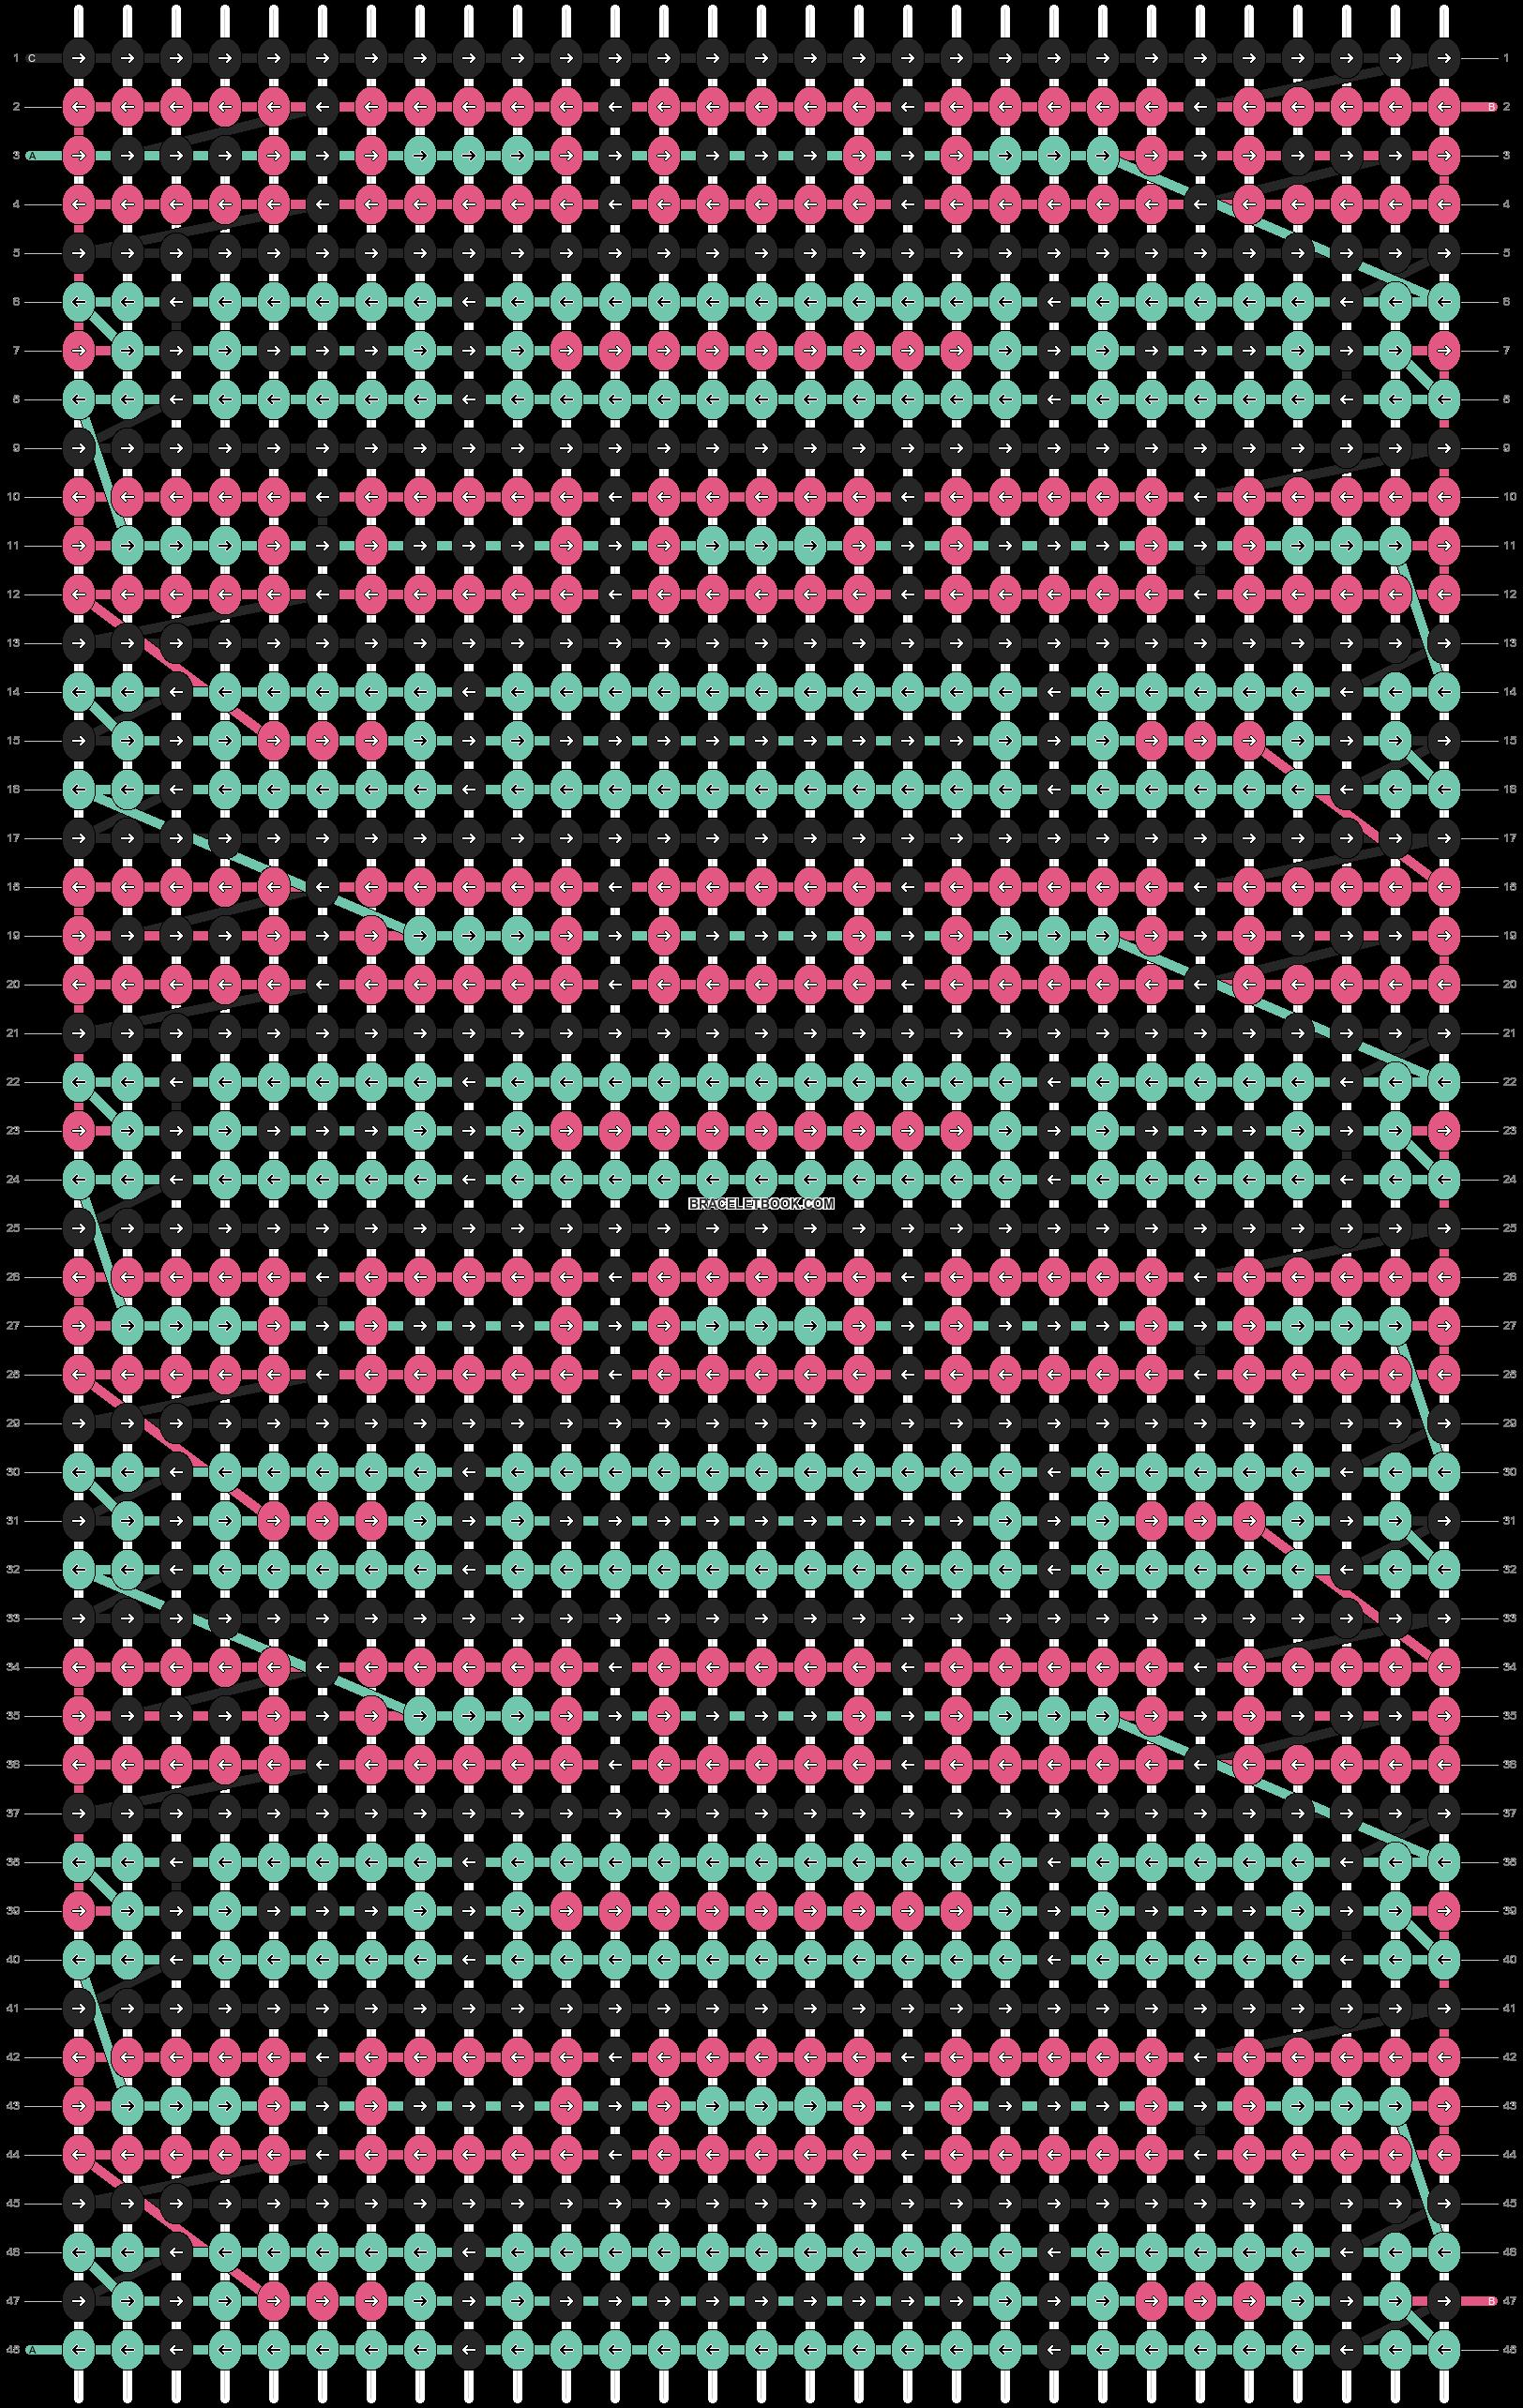 Alpha pattern #89301 pattern